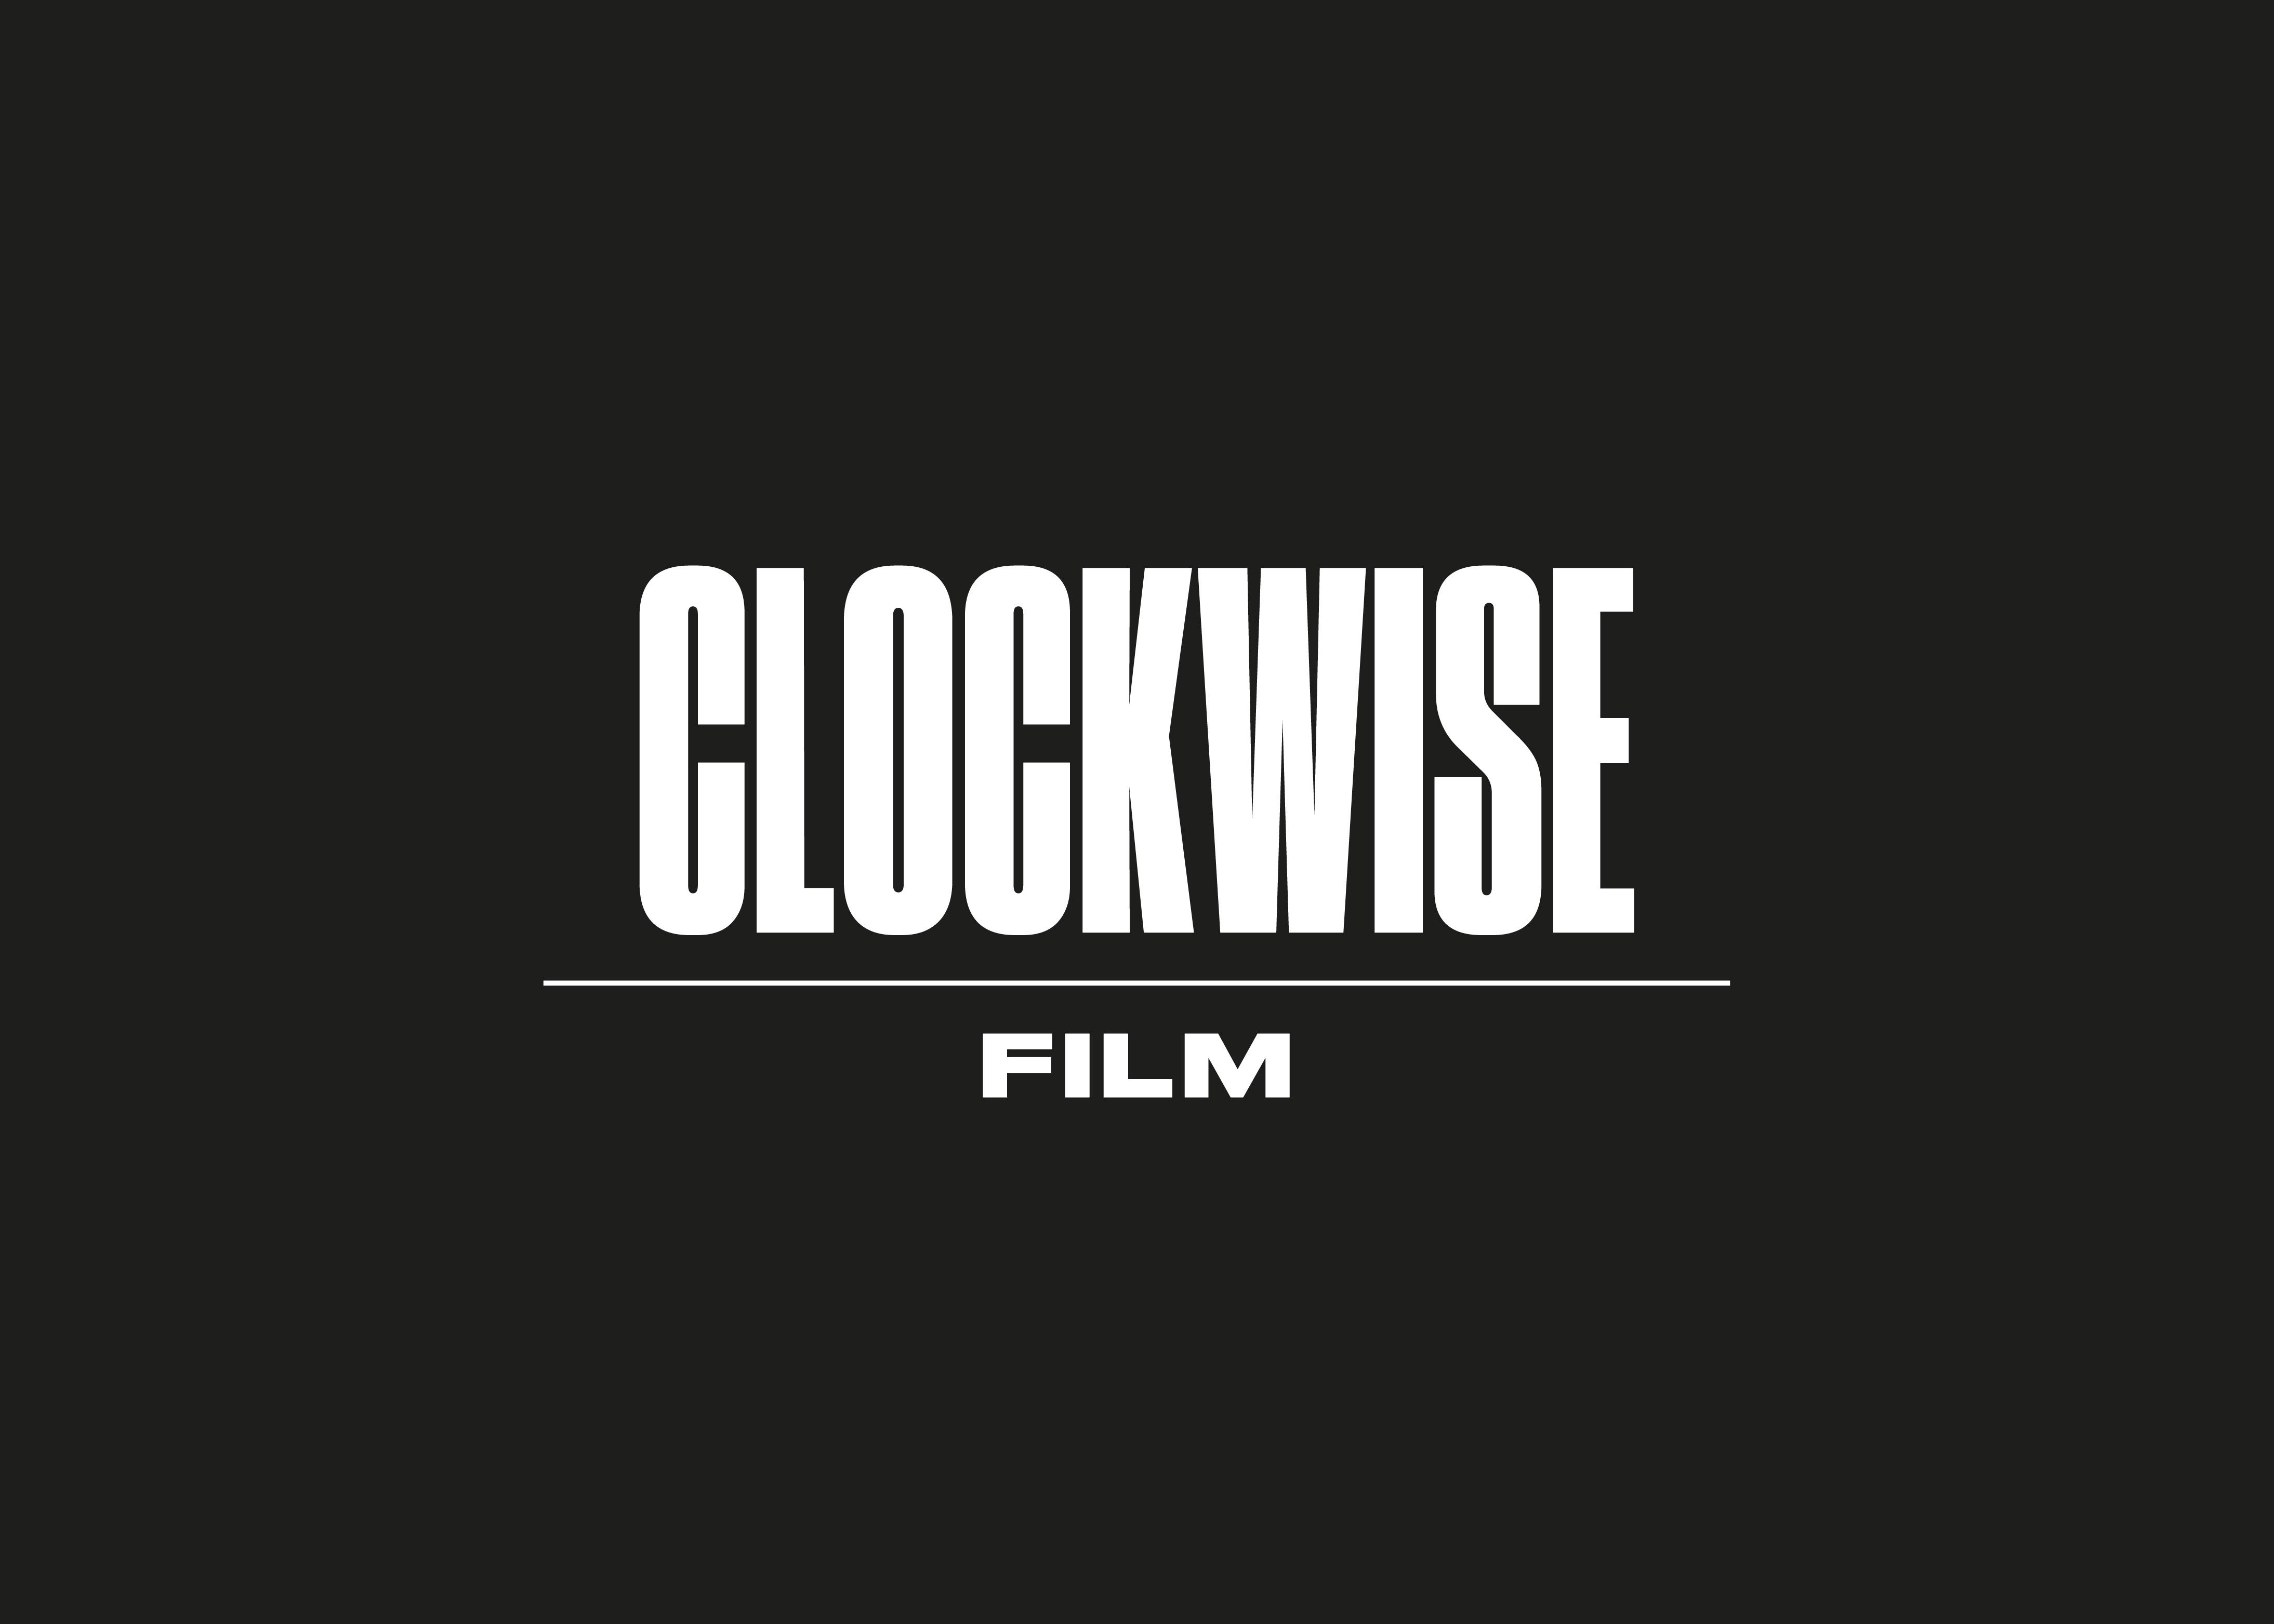 White Clockwise logo on a black background by Fiasco Design